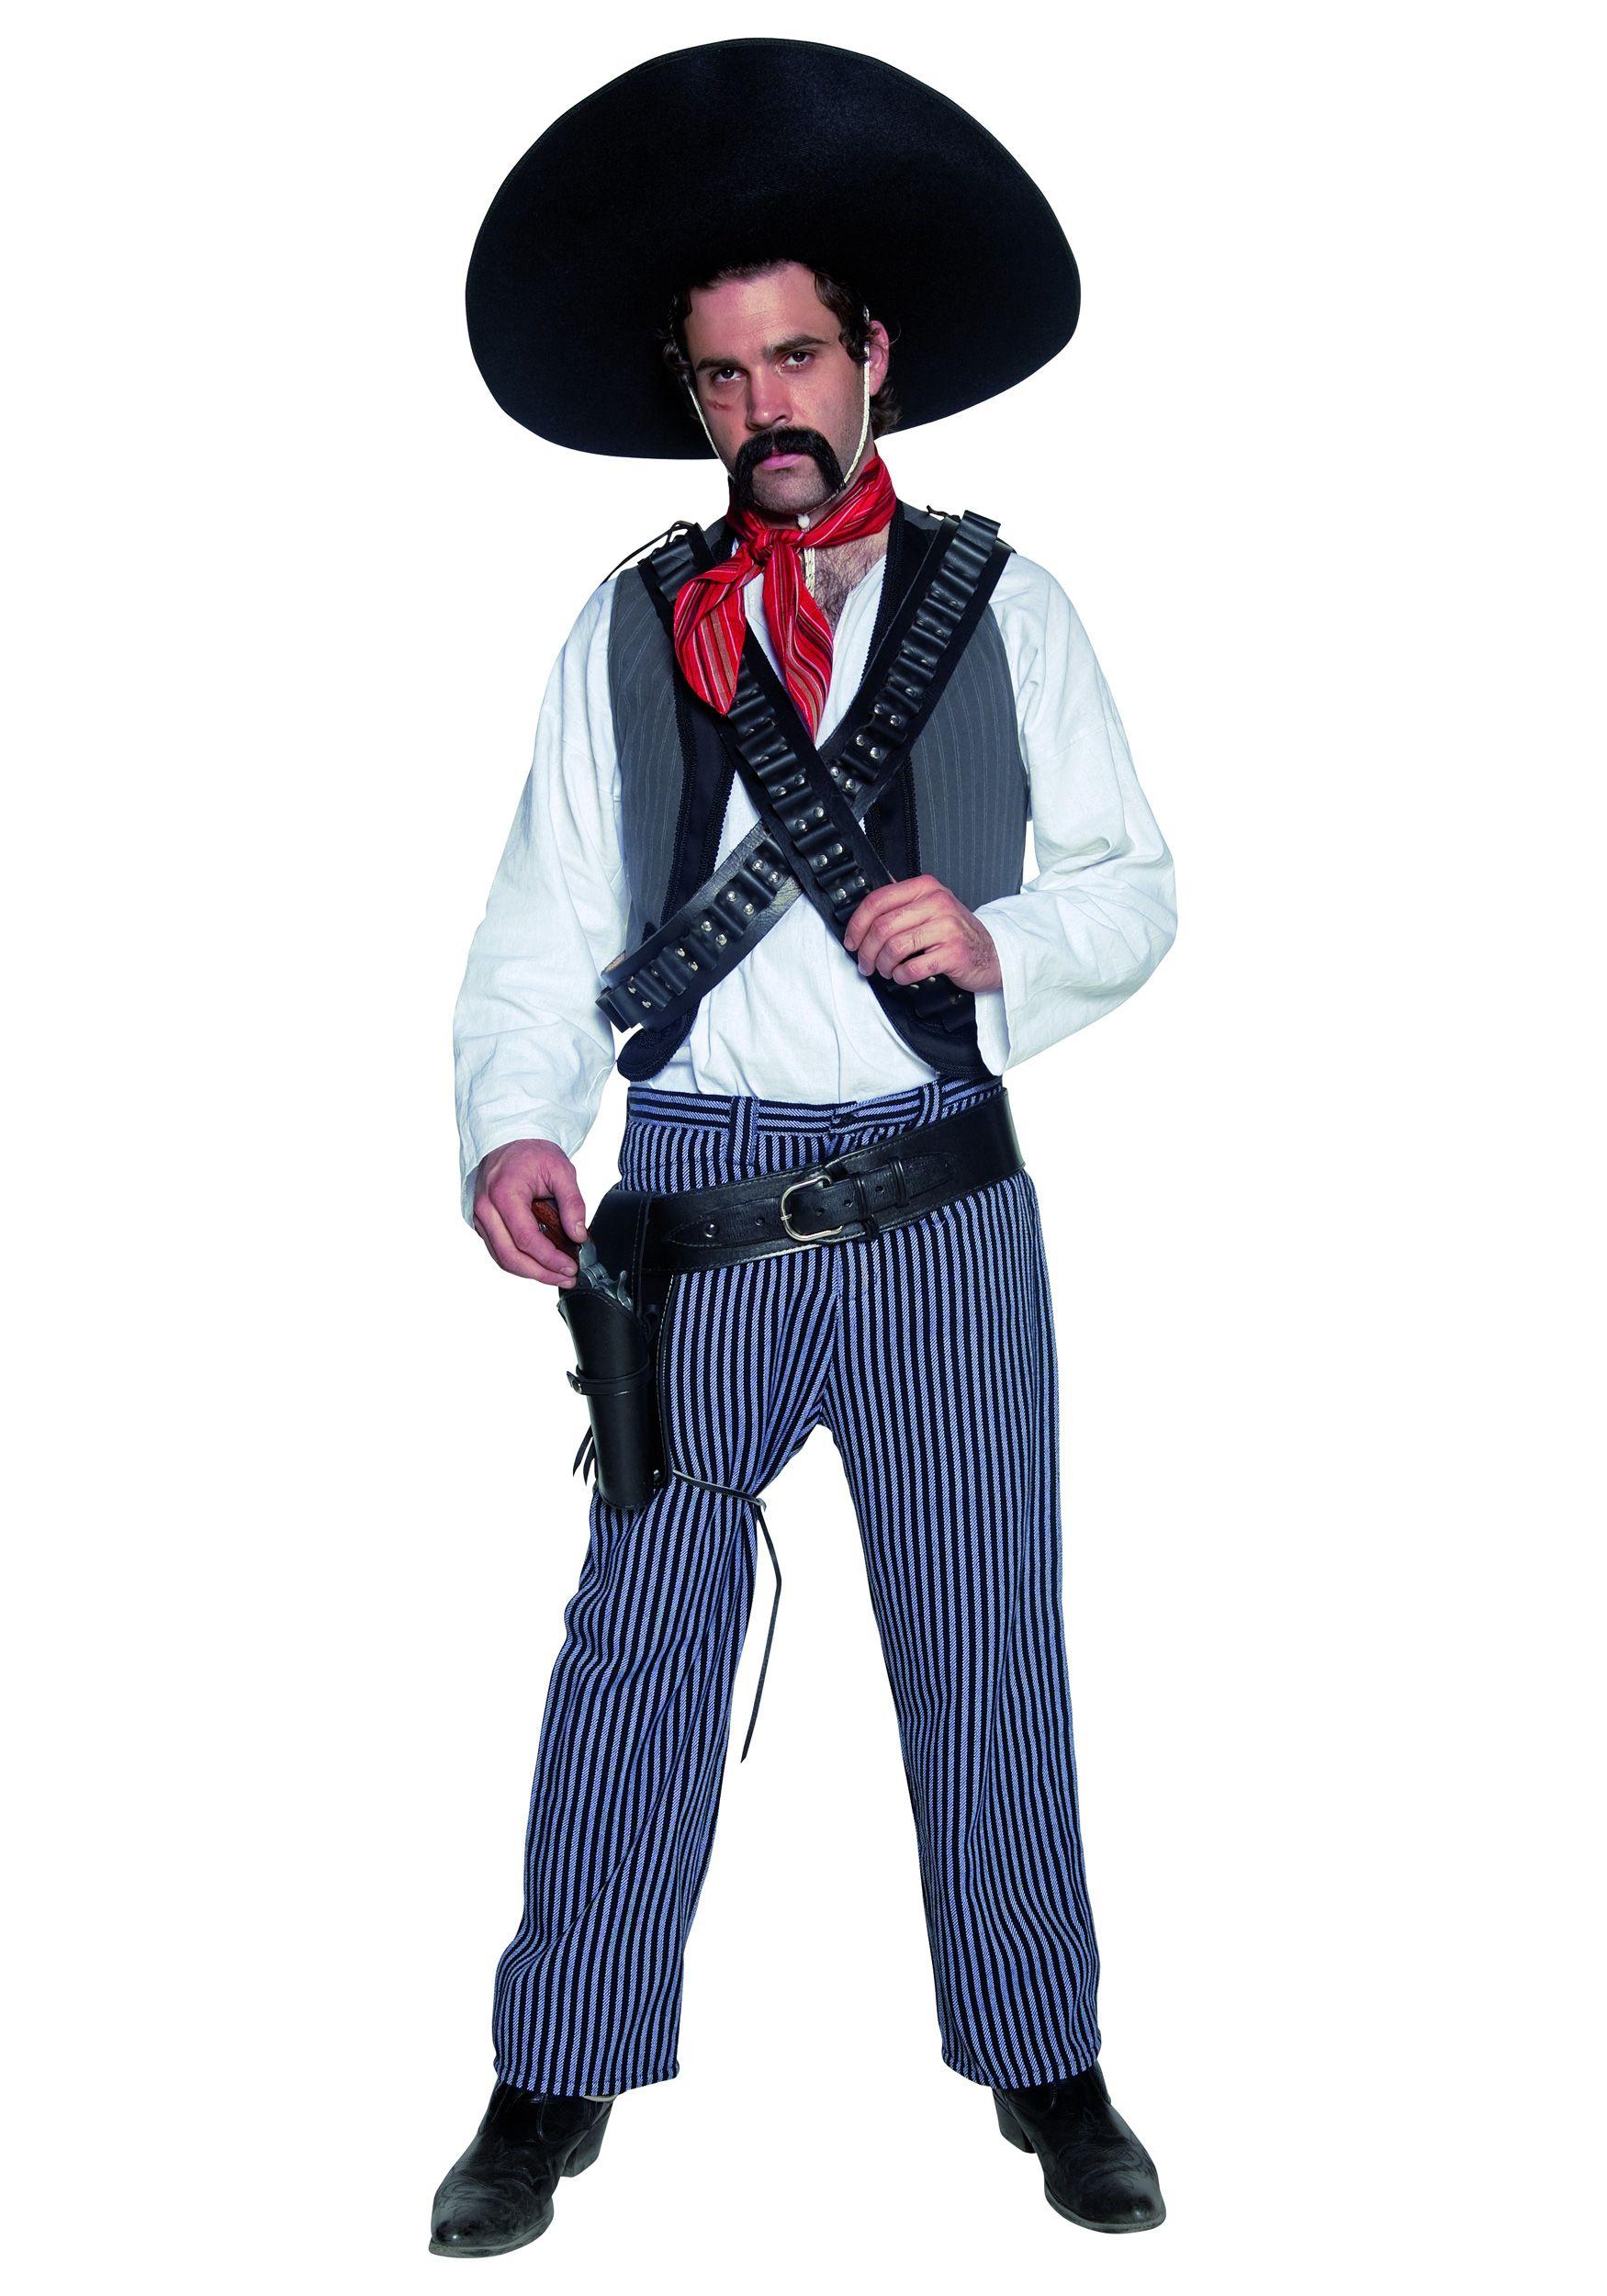 560a0d6c51ba9 Pancho Villa Mexican Fancy Dress